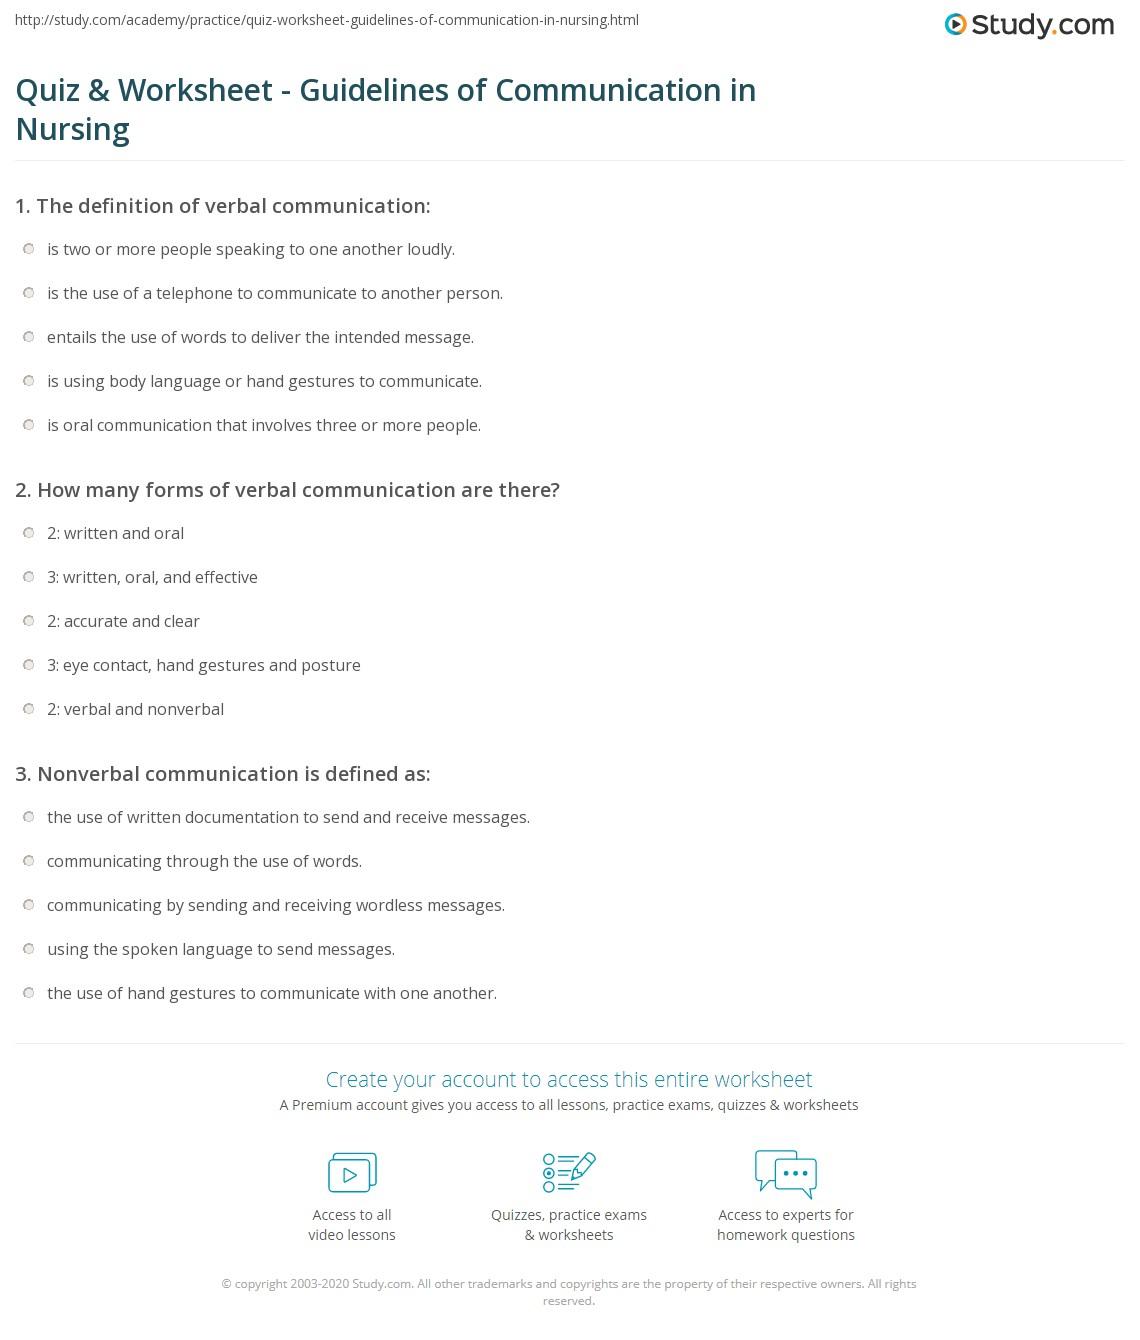 Quiz & Worksheet - Guidelines of Communication in Nursing